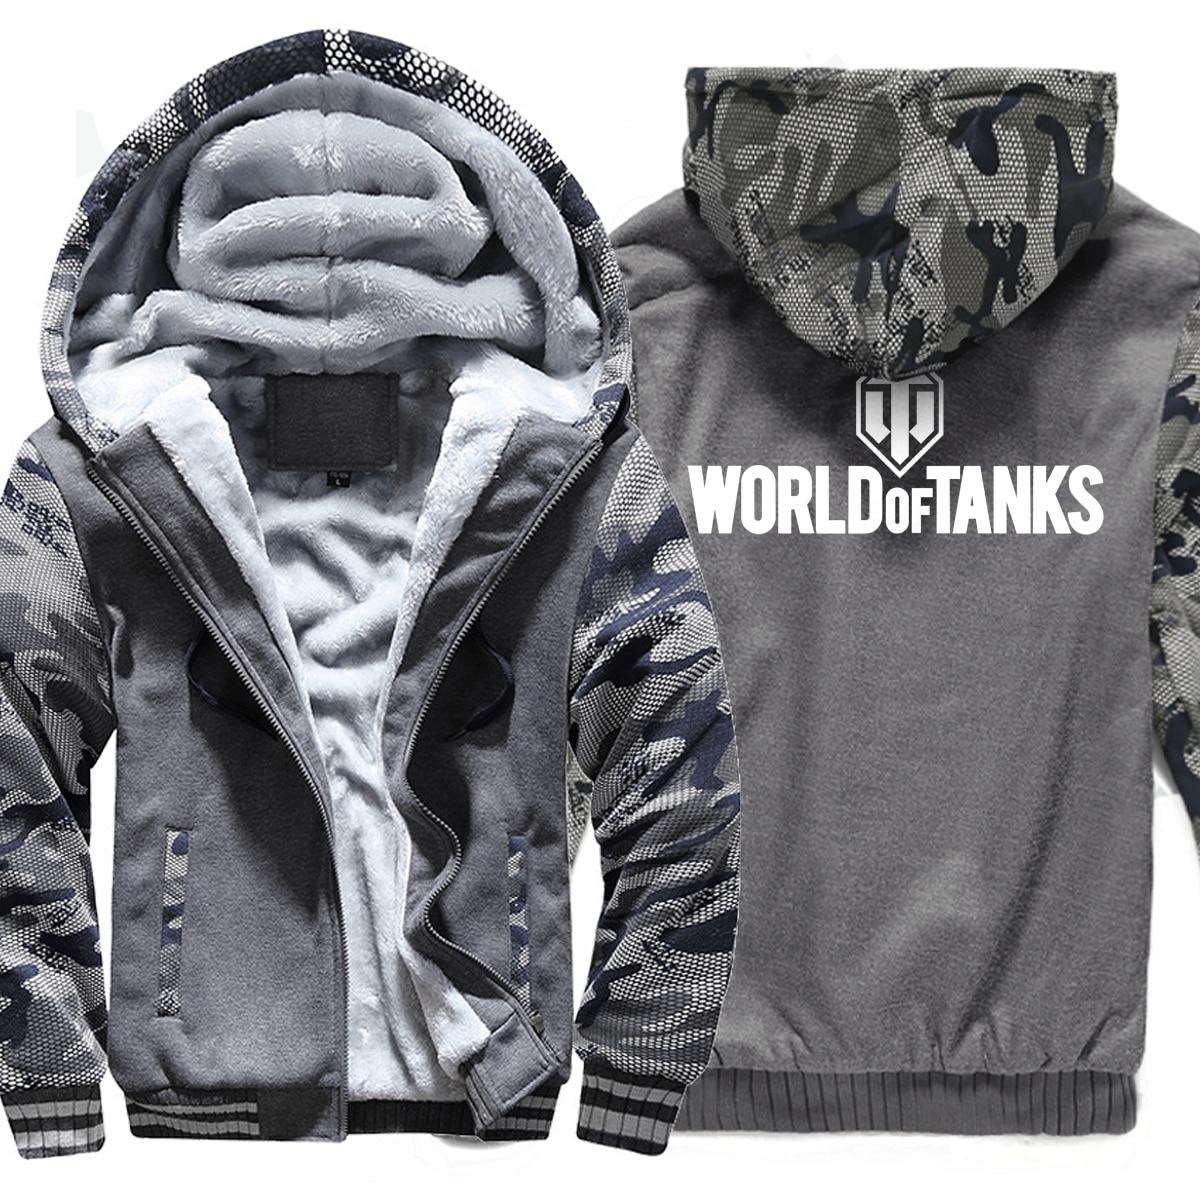 2019 winter sweatshirts Print men hoodies Jersey Men's sweatshirts tracksuit hoody Hipster hip hop crossfit k-pop Brand Clothing